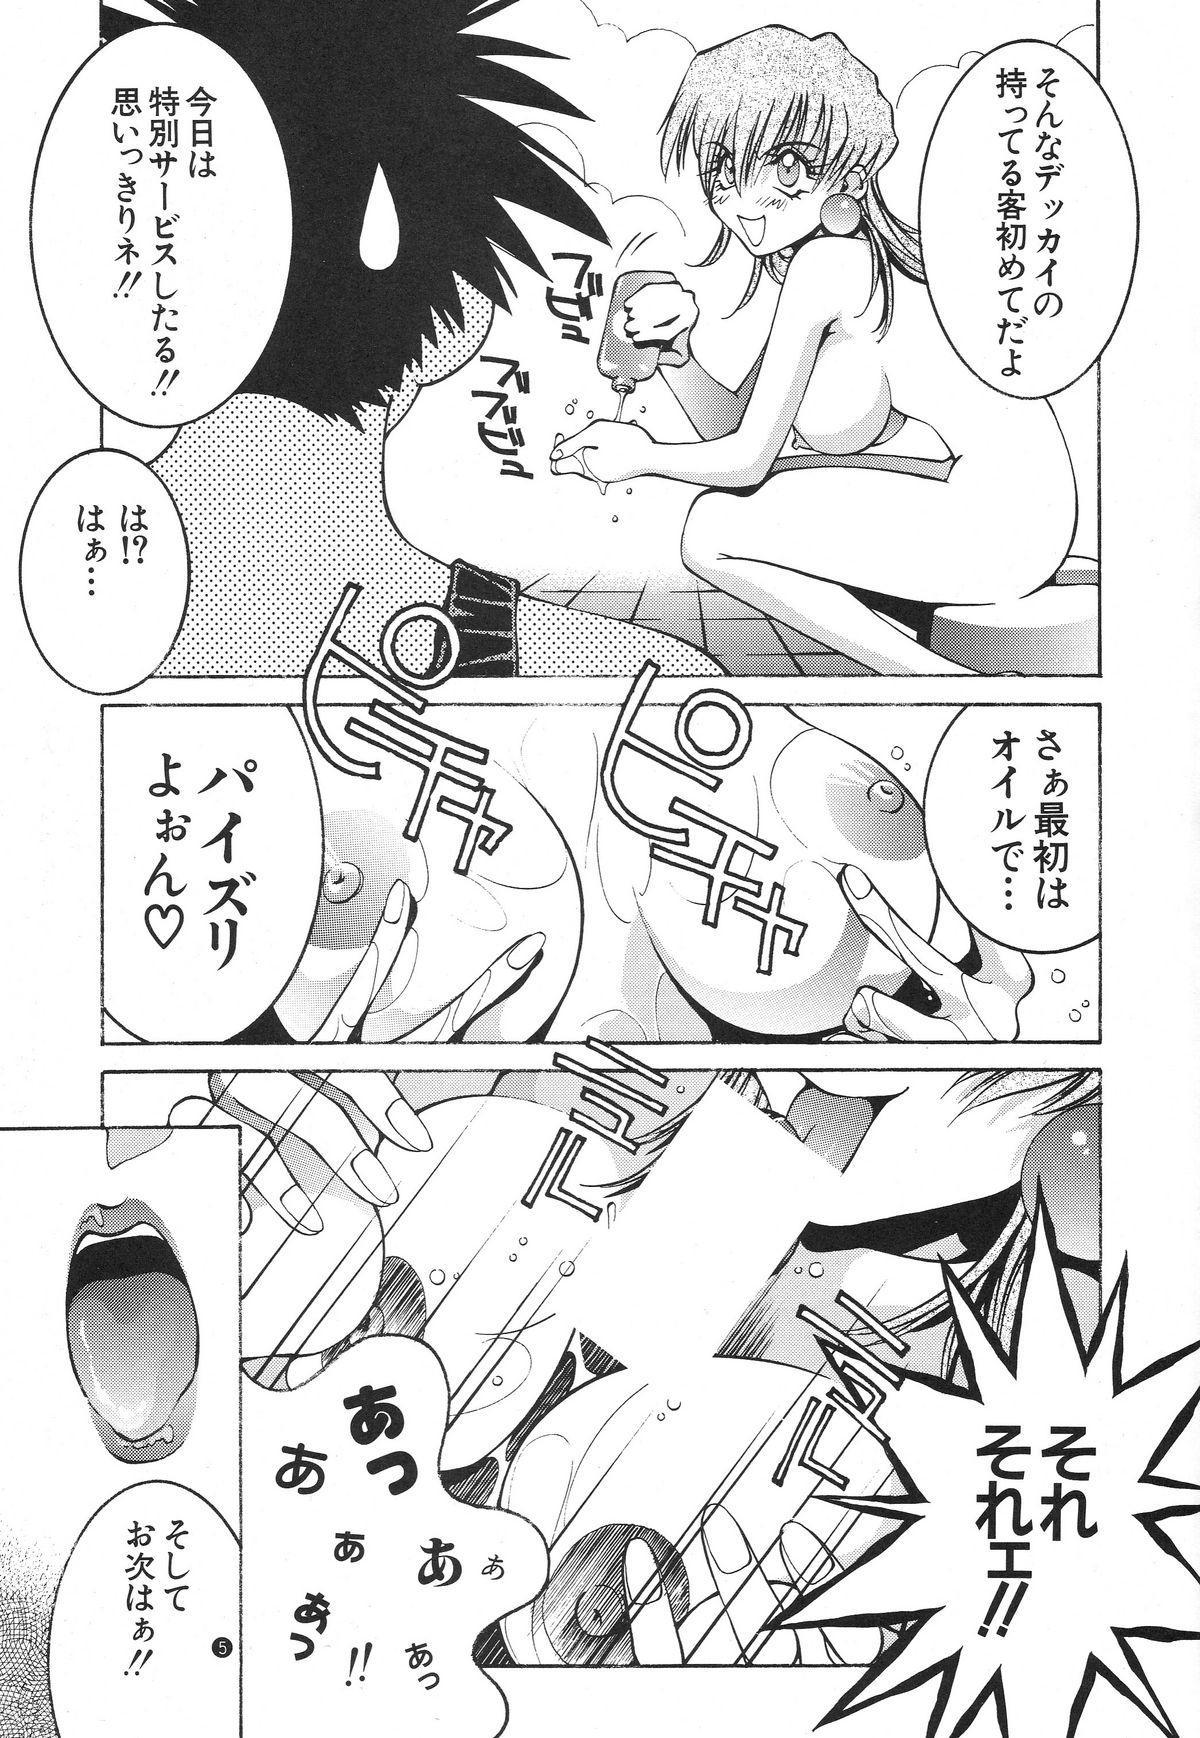 Nori-Haru 5